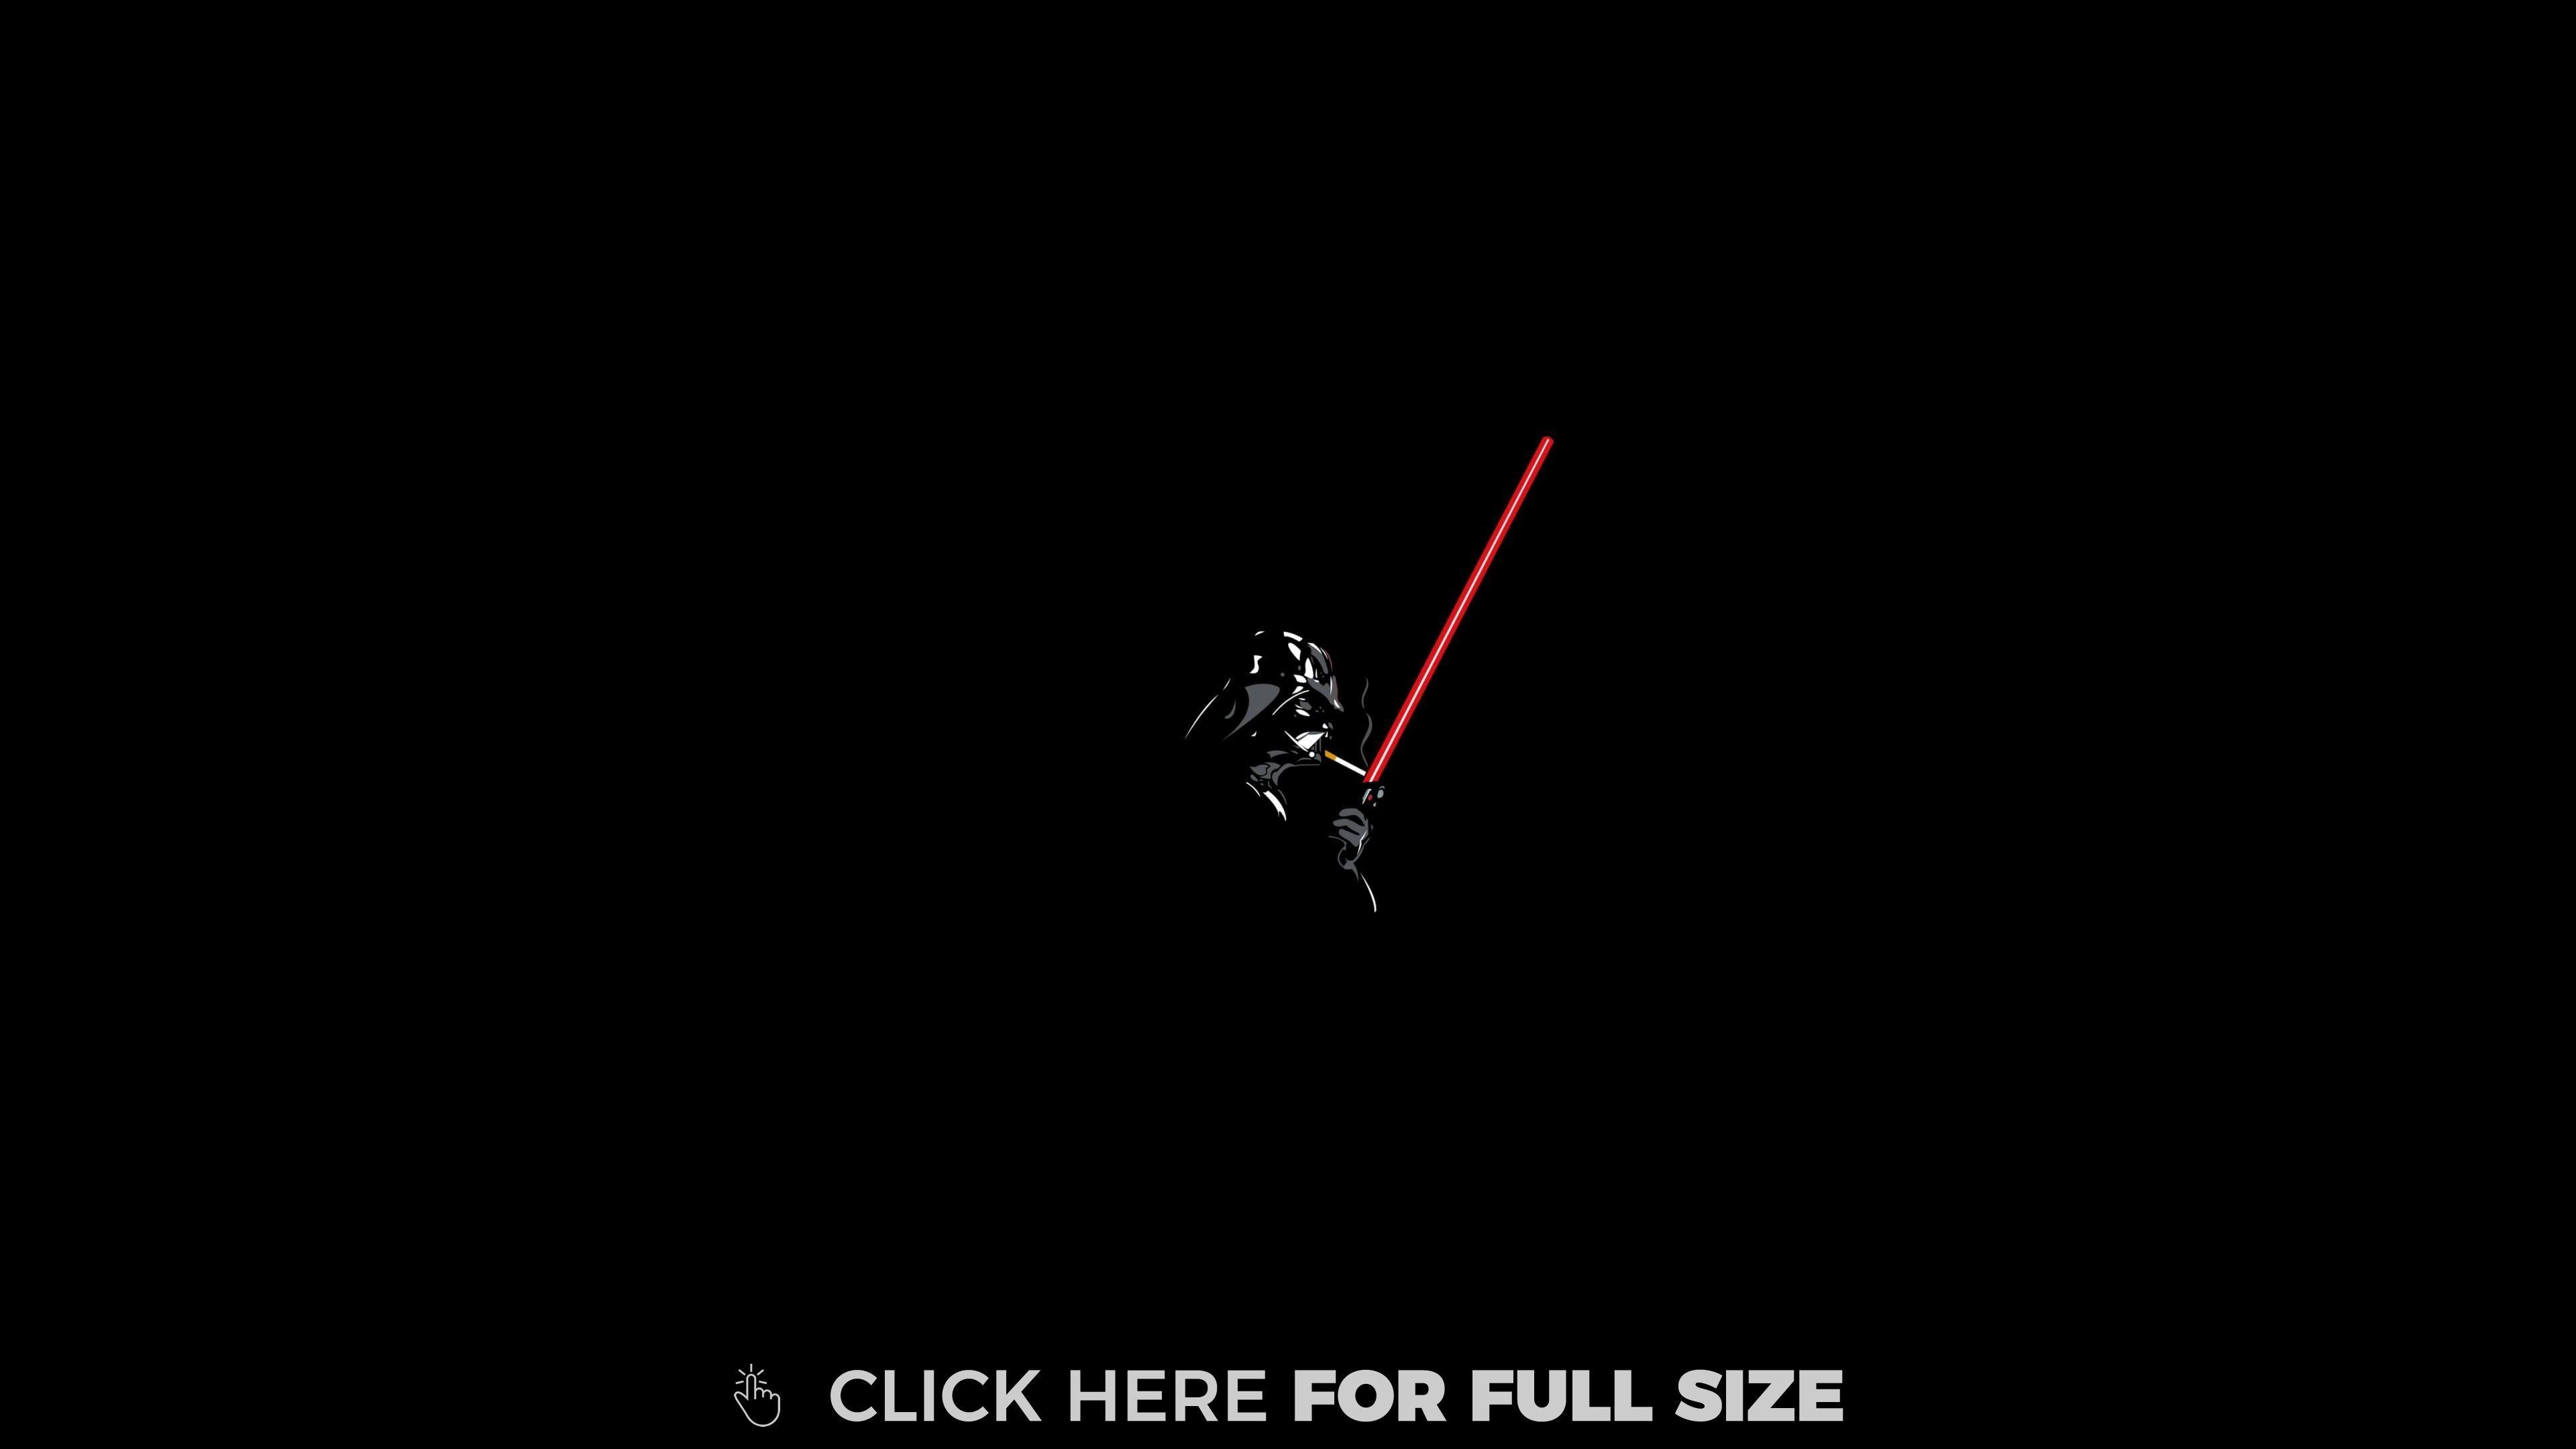 Darth Vader Lighting a Cigarette | Desktop Wallpapers | Pinterest.